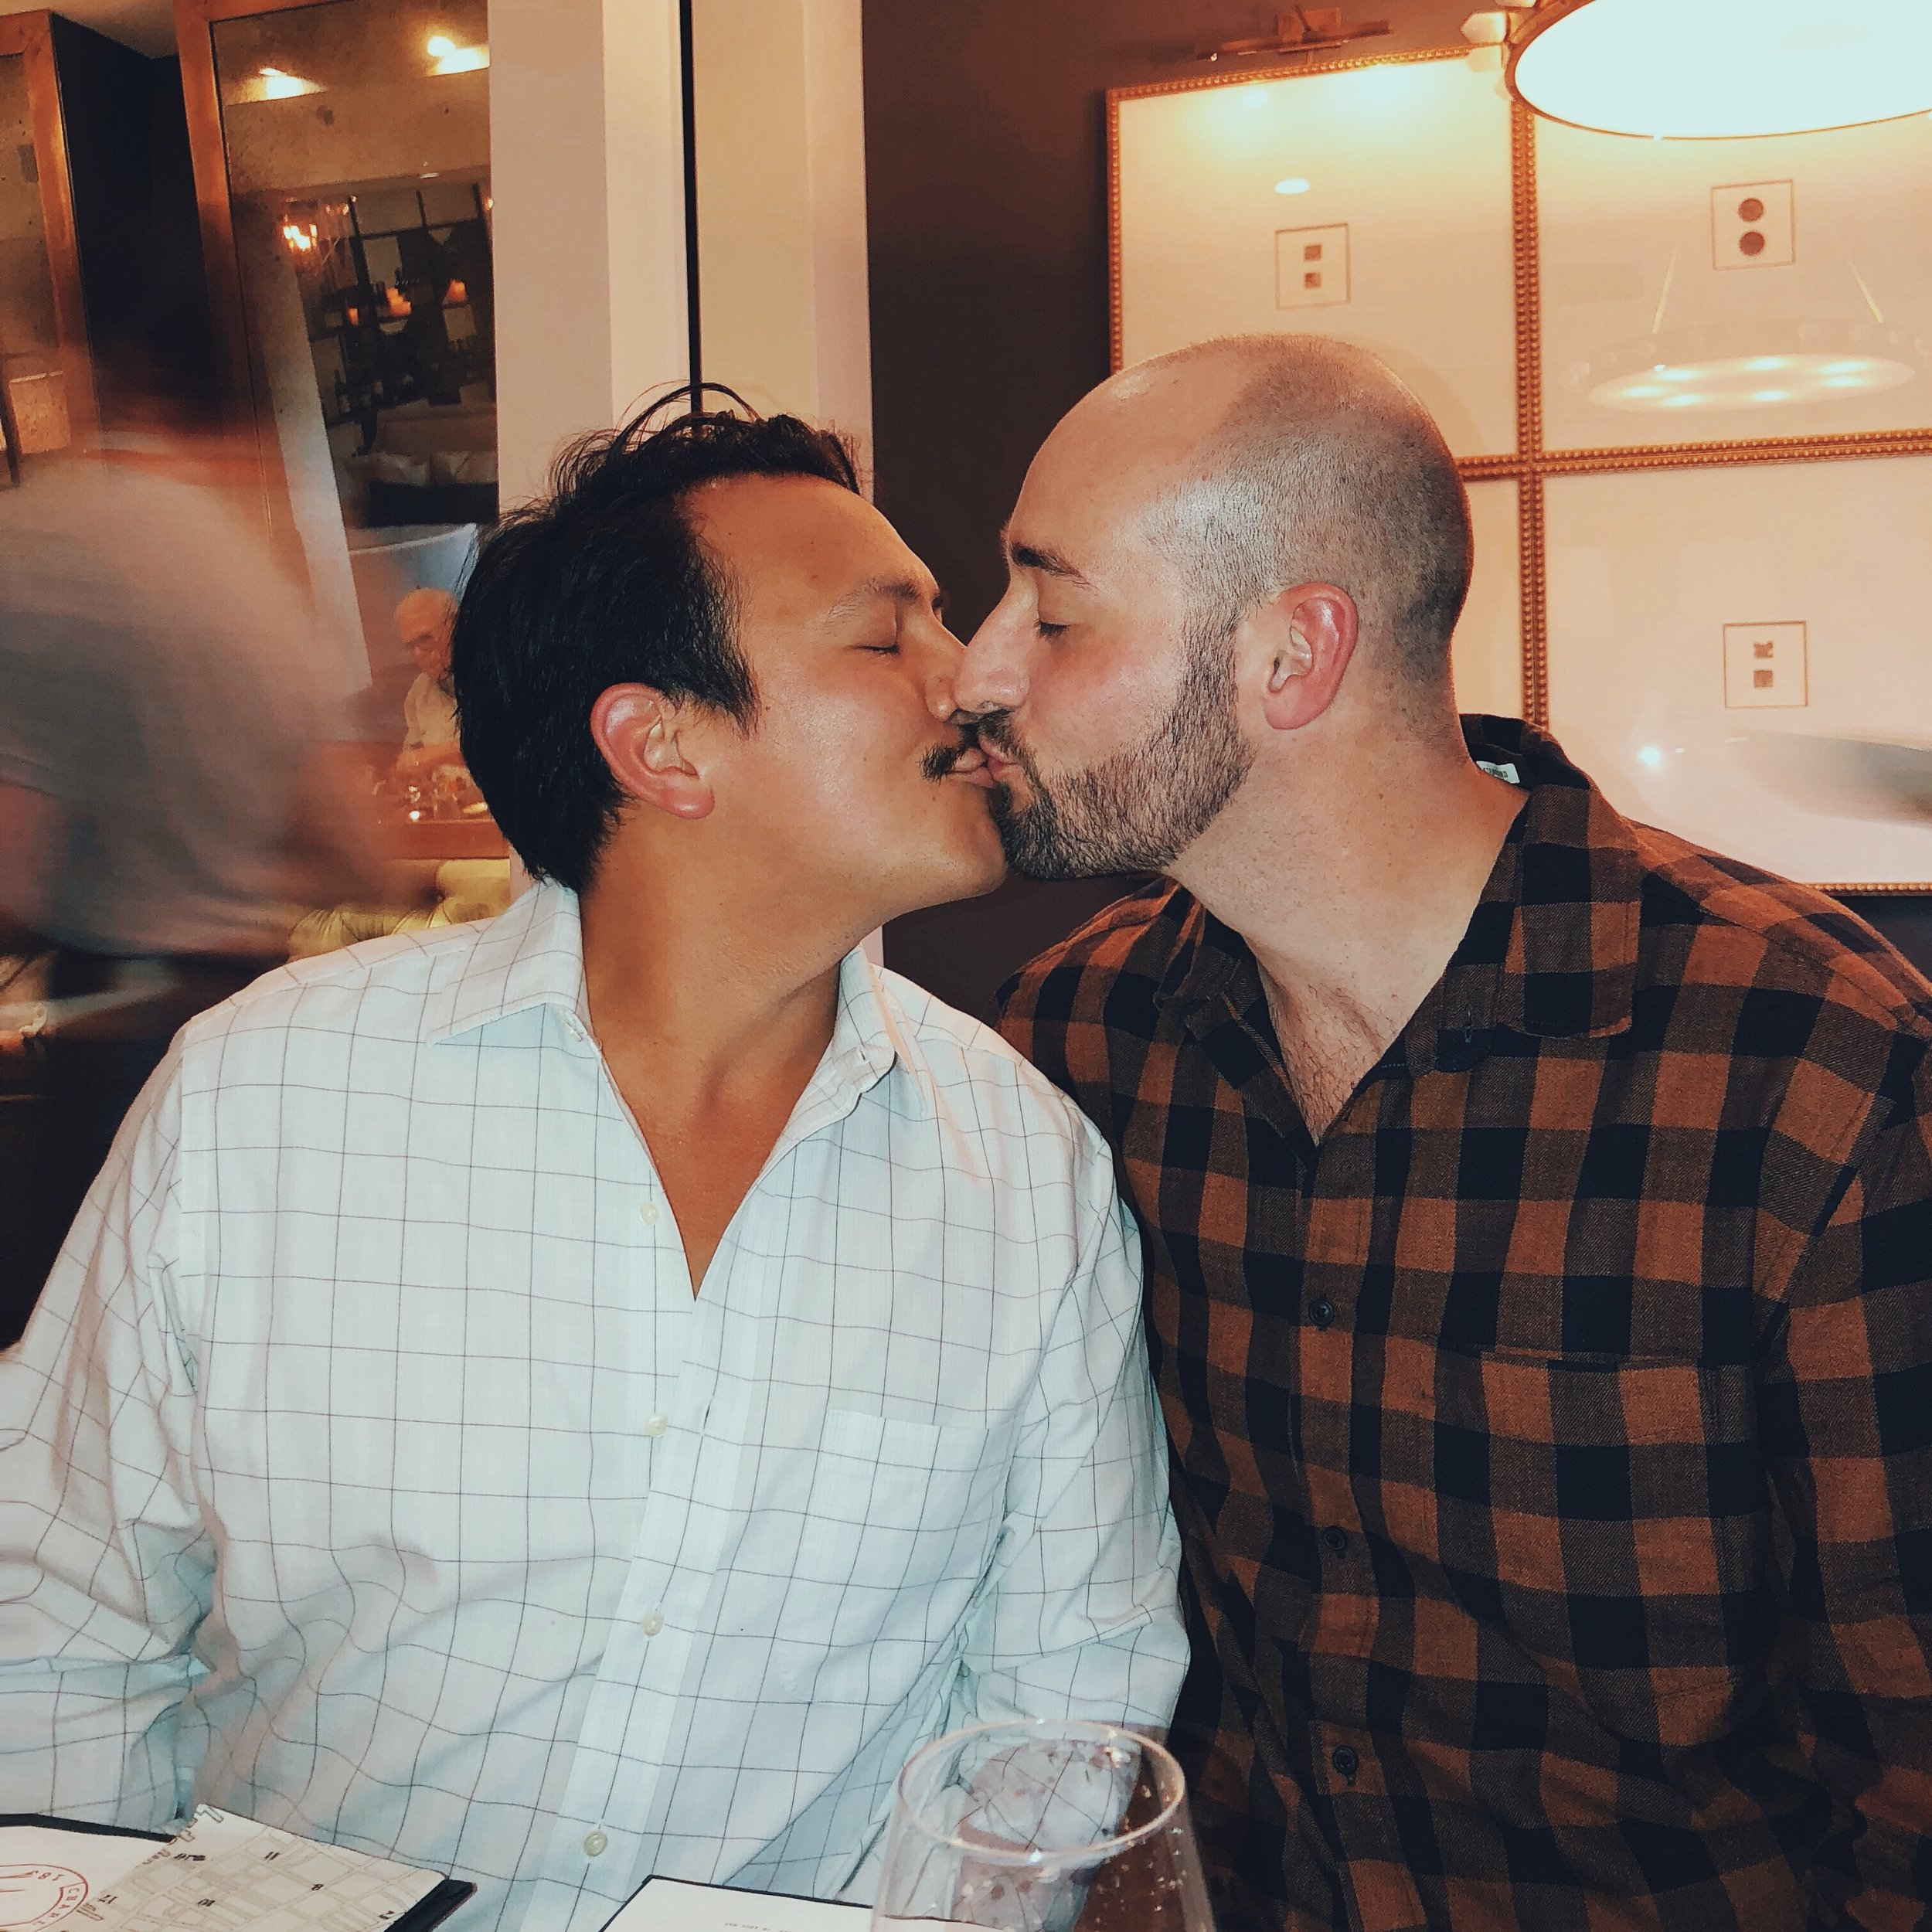 I Love That For You - Parcel 32 Kisses